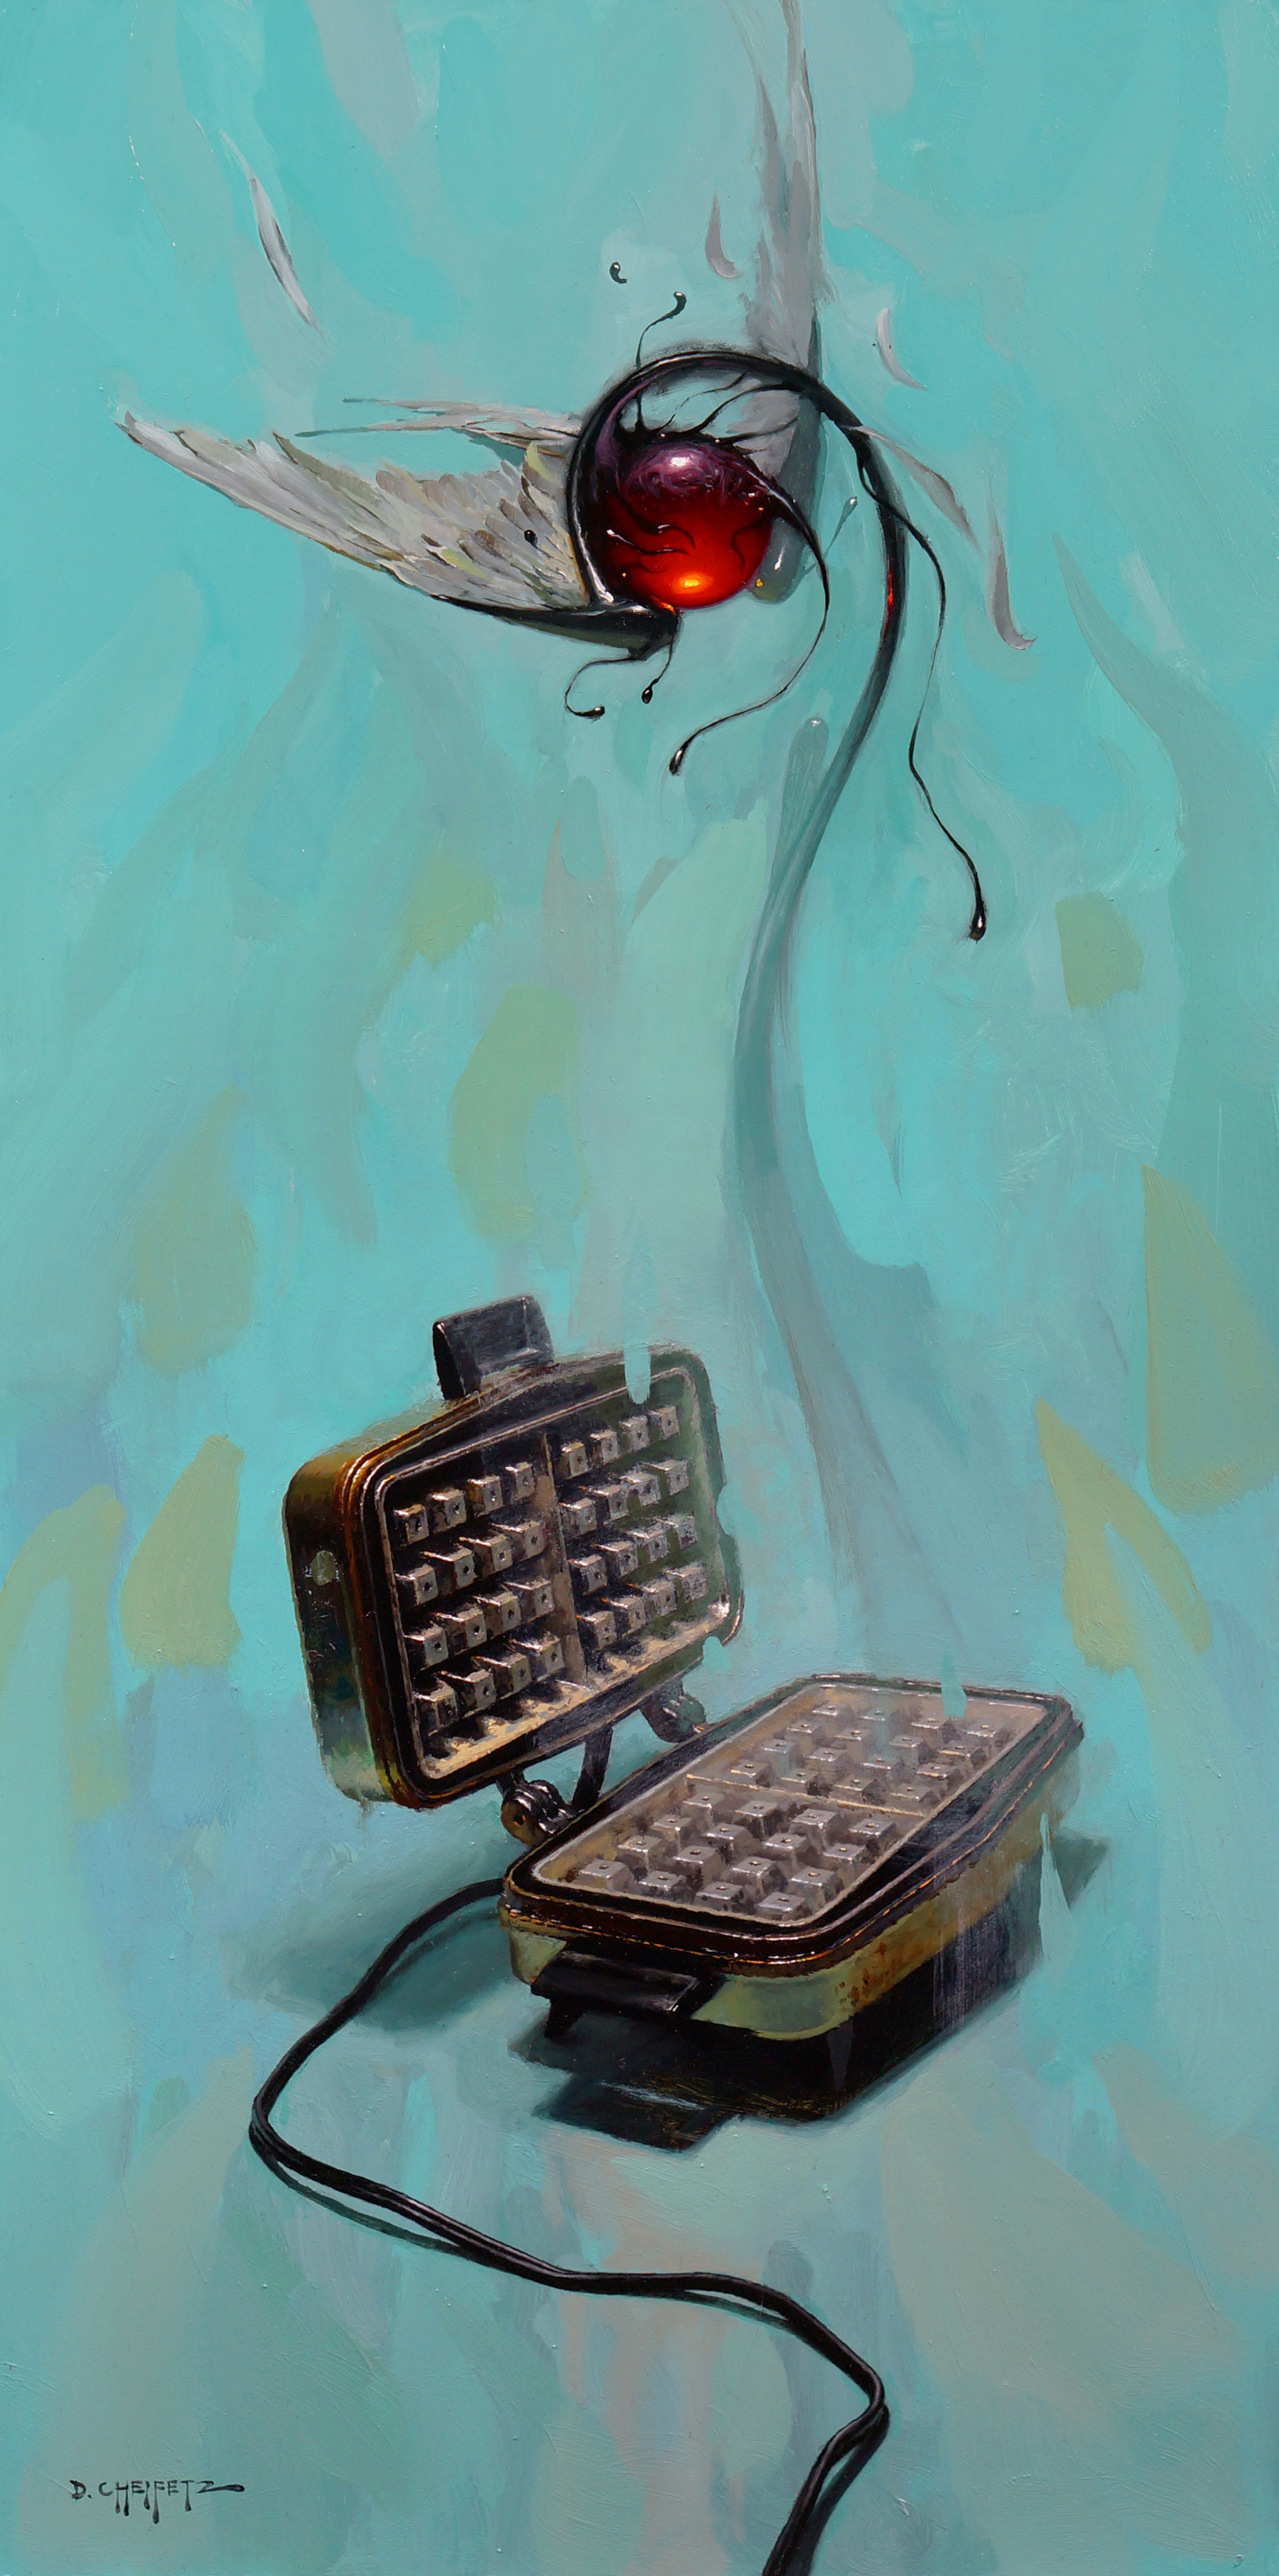 Ghost in the Machine by David Cheifetz